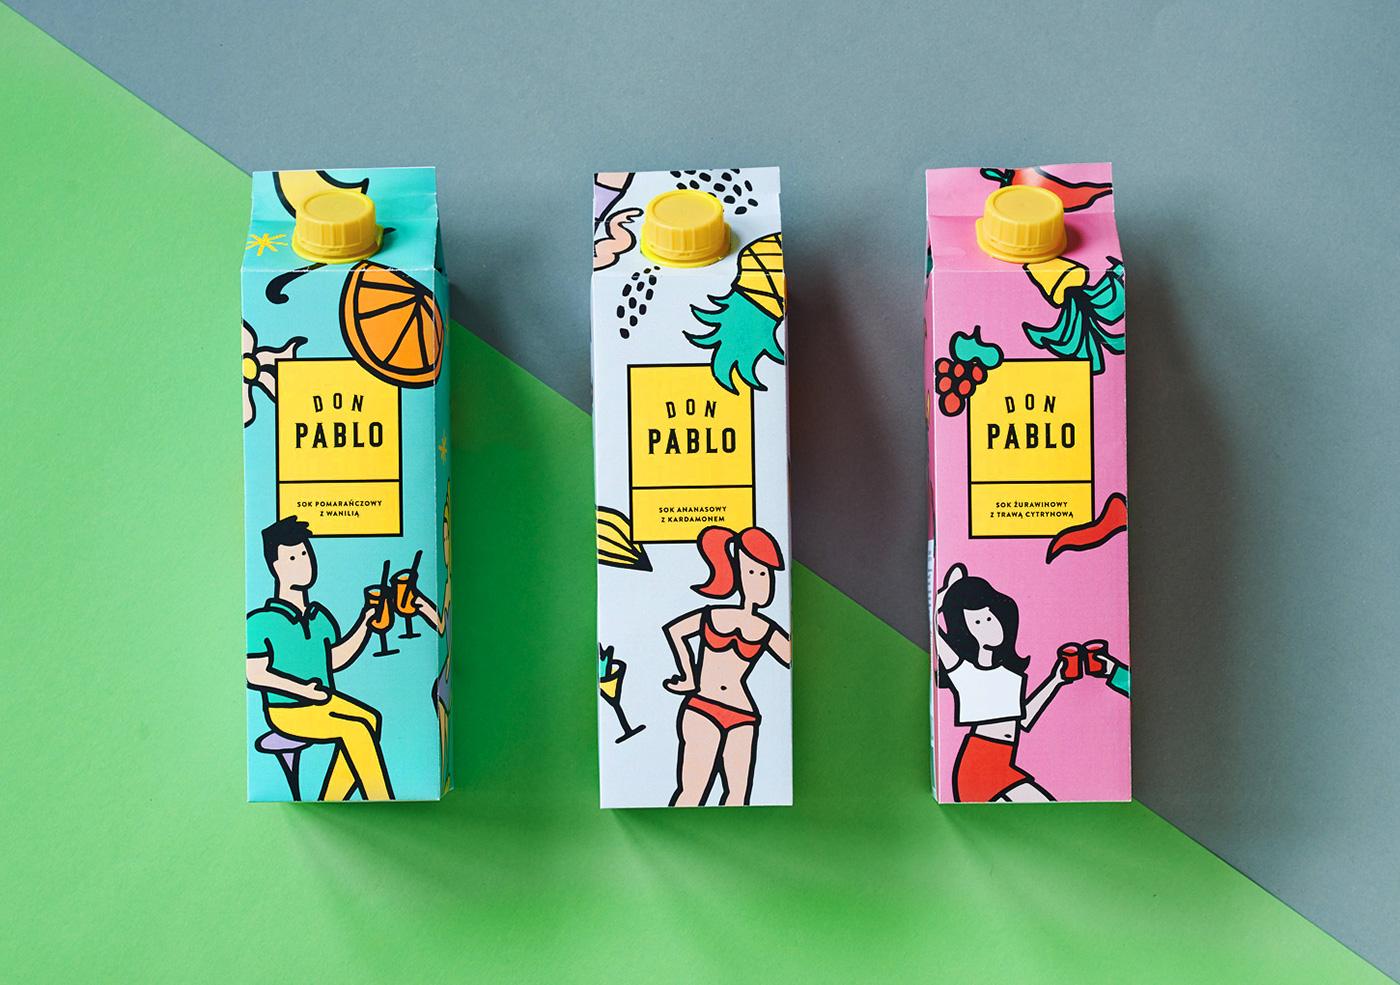 Don Pablo Label Art Designed By Paweł Jaczewski